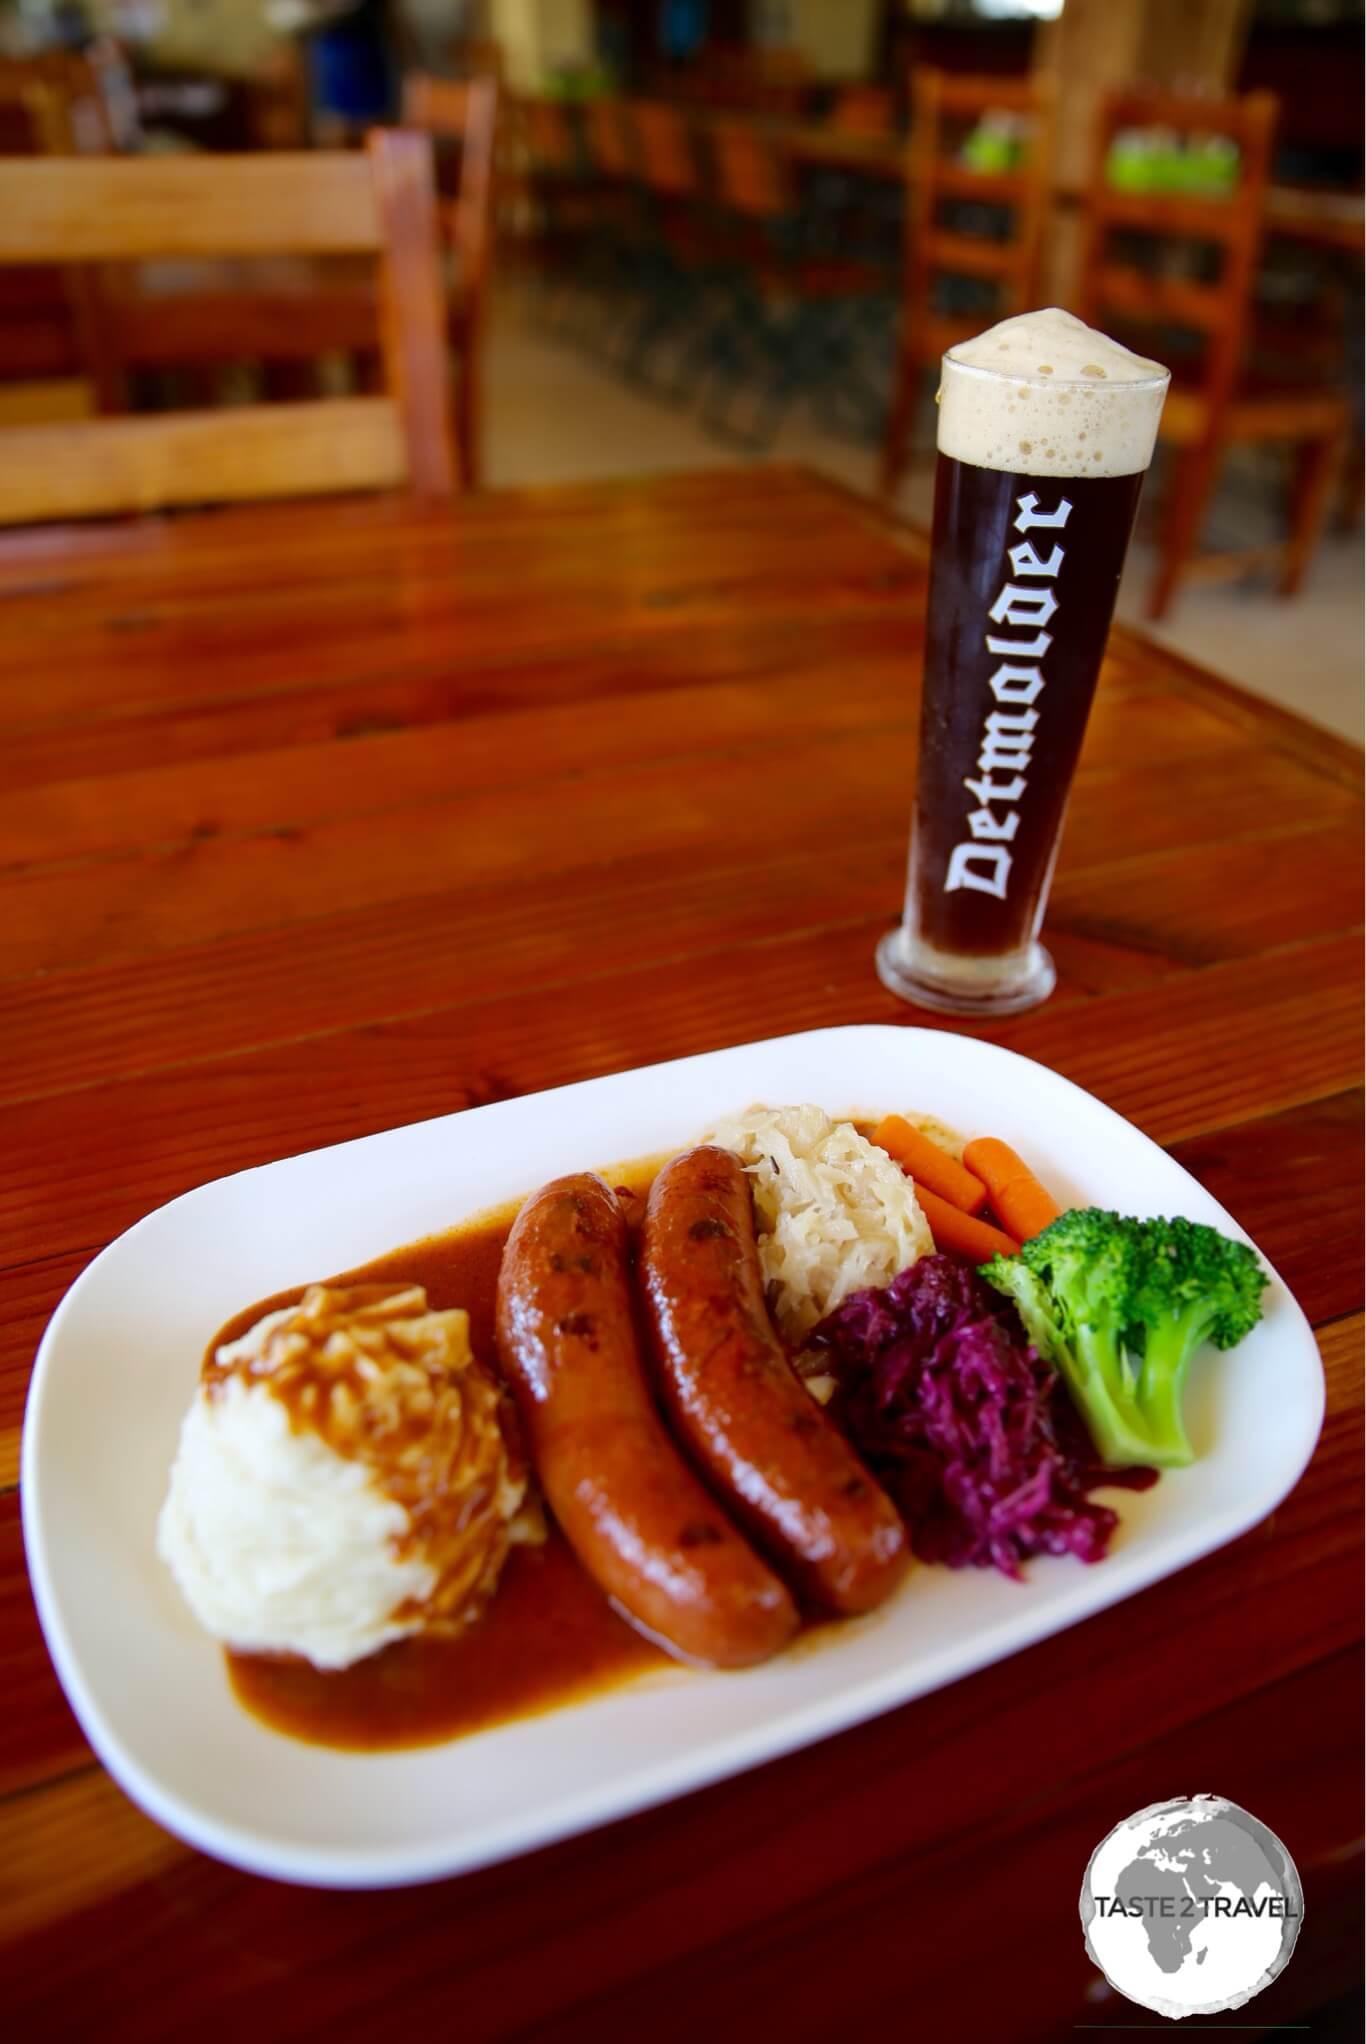 A delicious (lekker) lunch at McKraut's German restaurant in Inarajan.